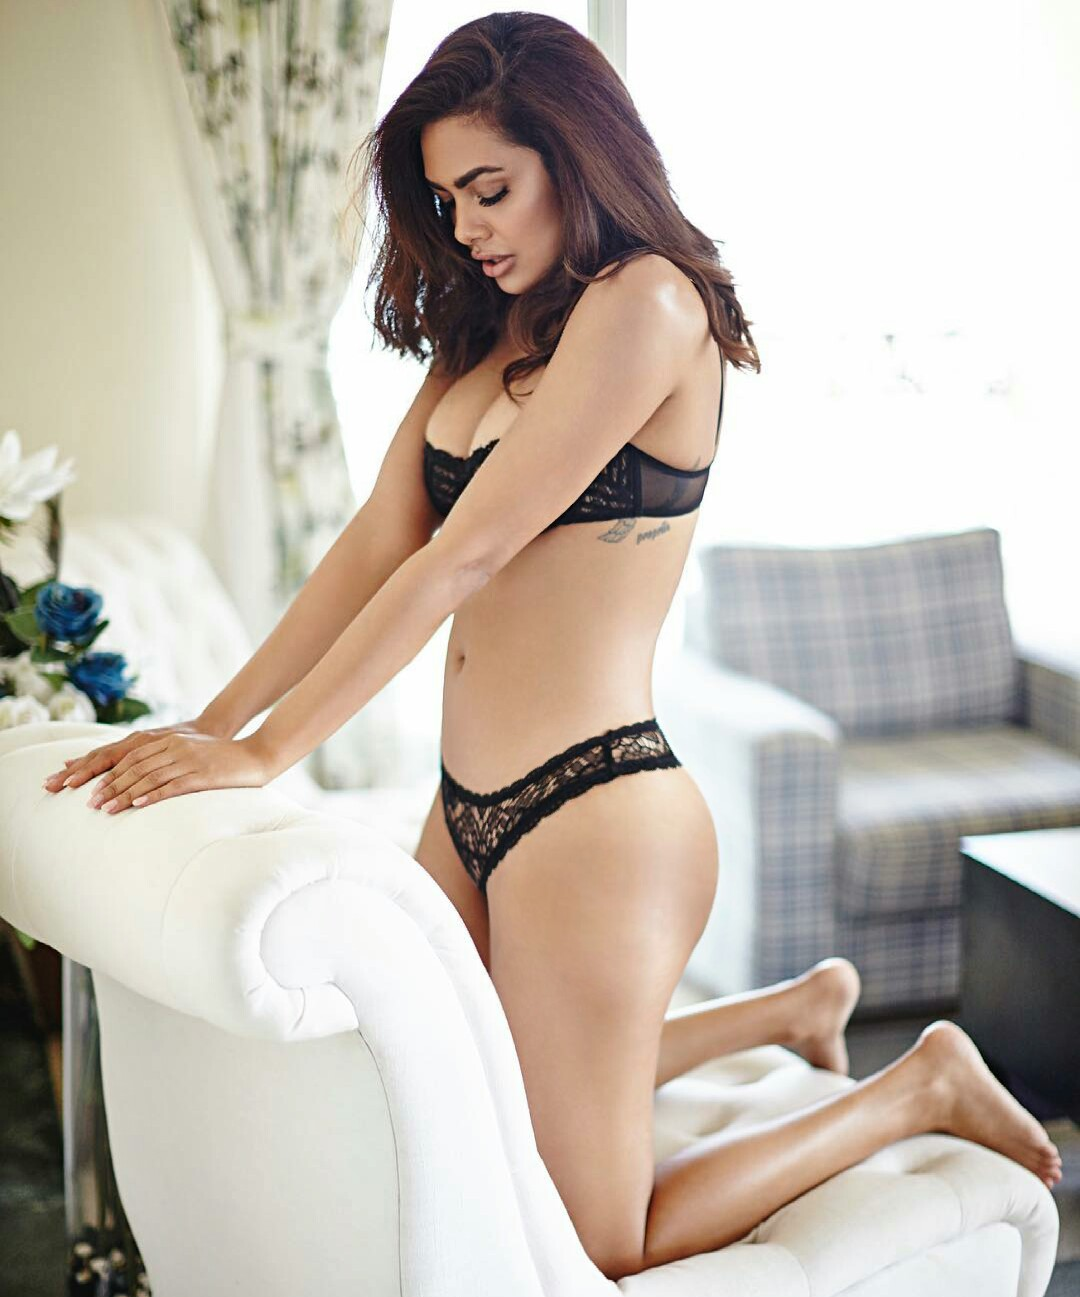 Esha Gupta Hot Seductive Bikini Photoshoot - Beautiful Actress-5410